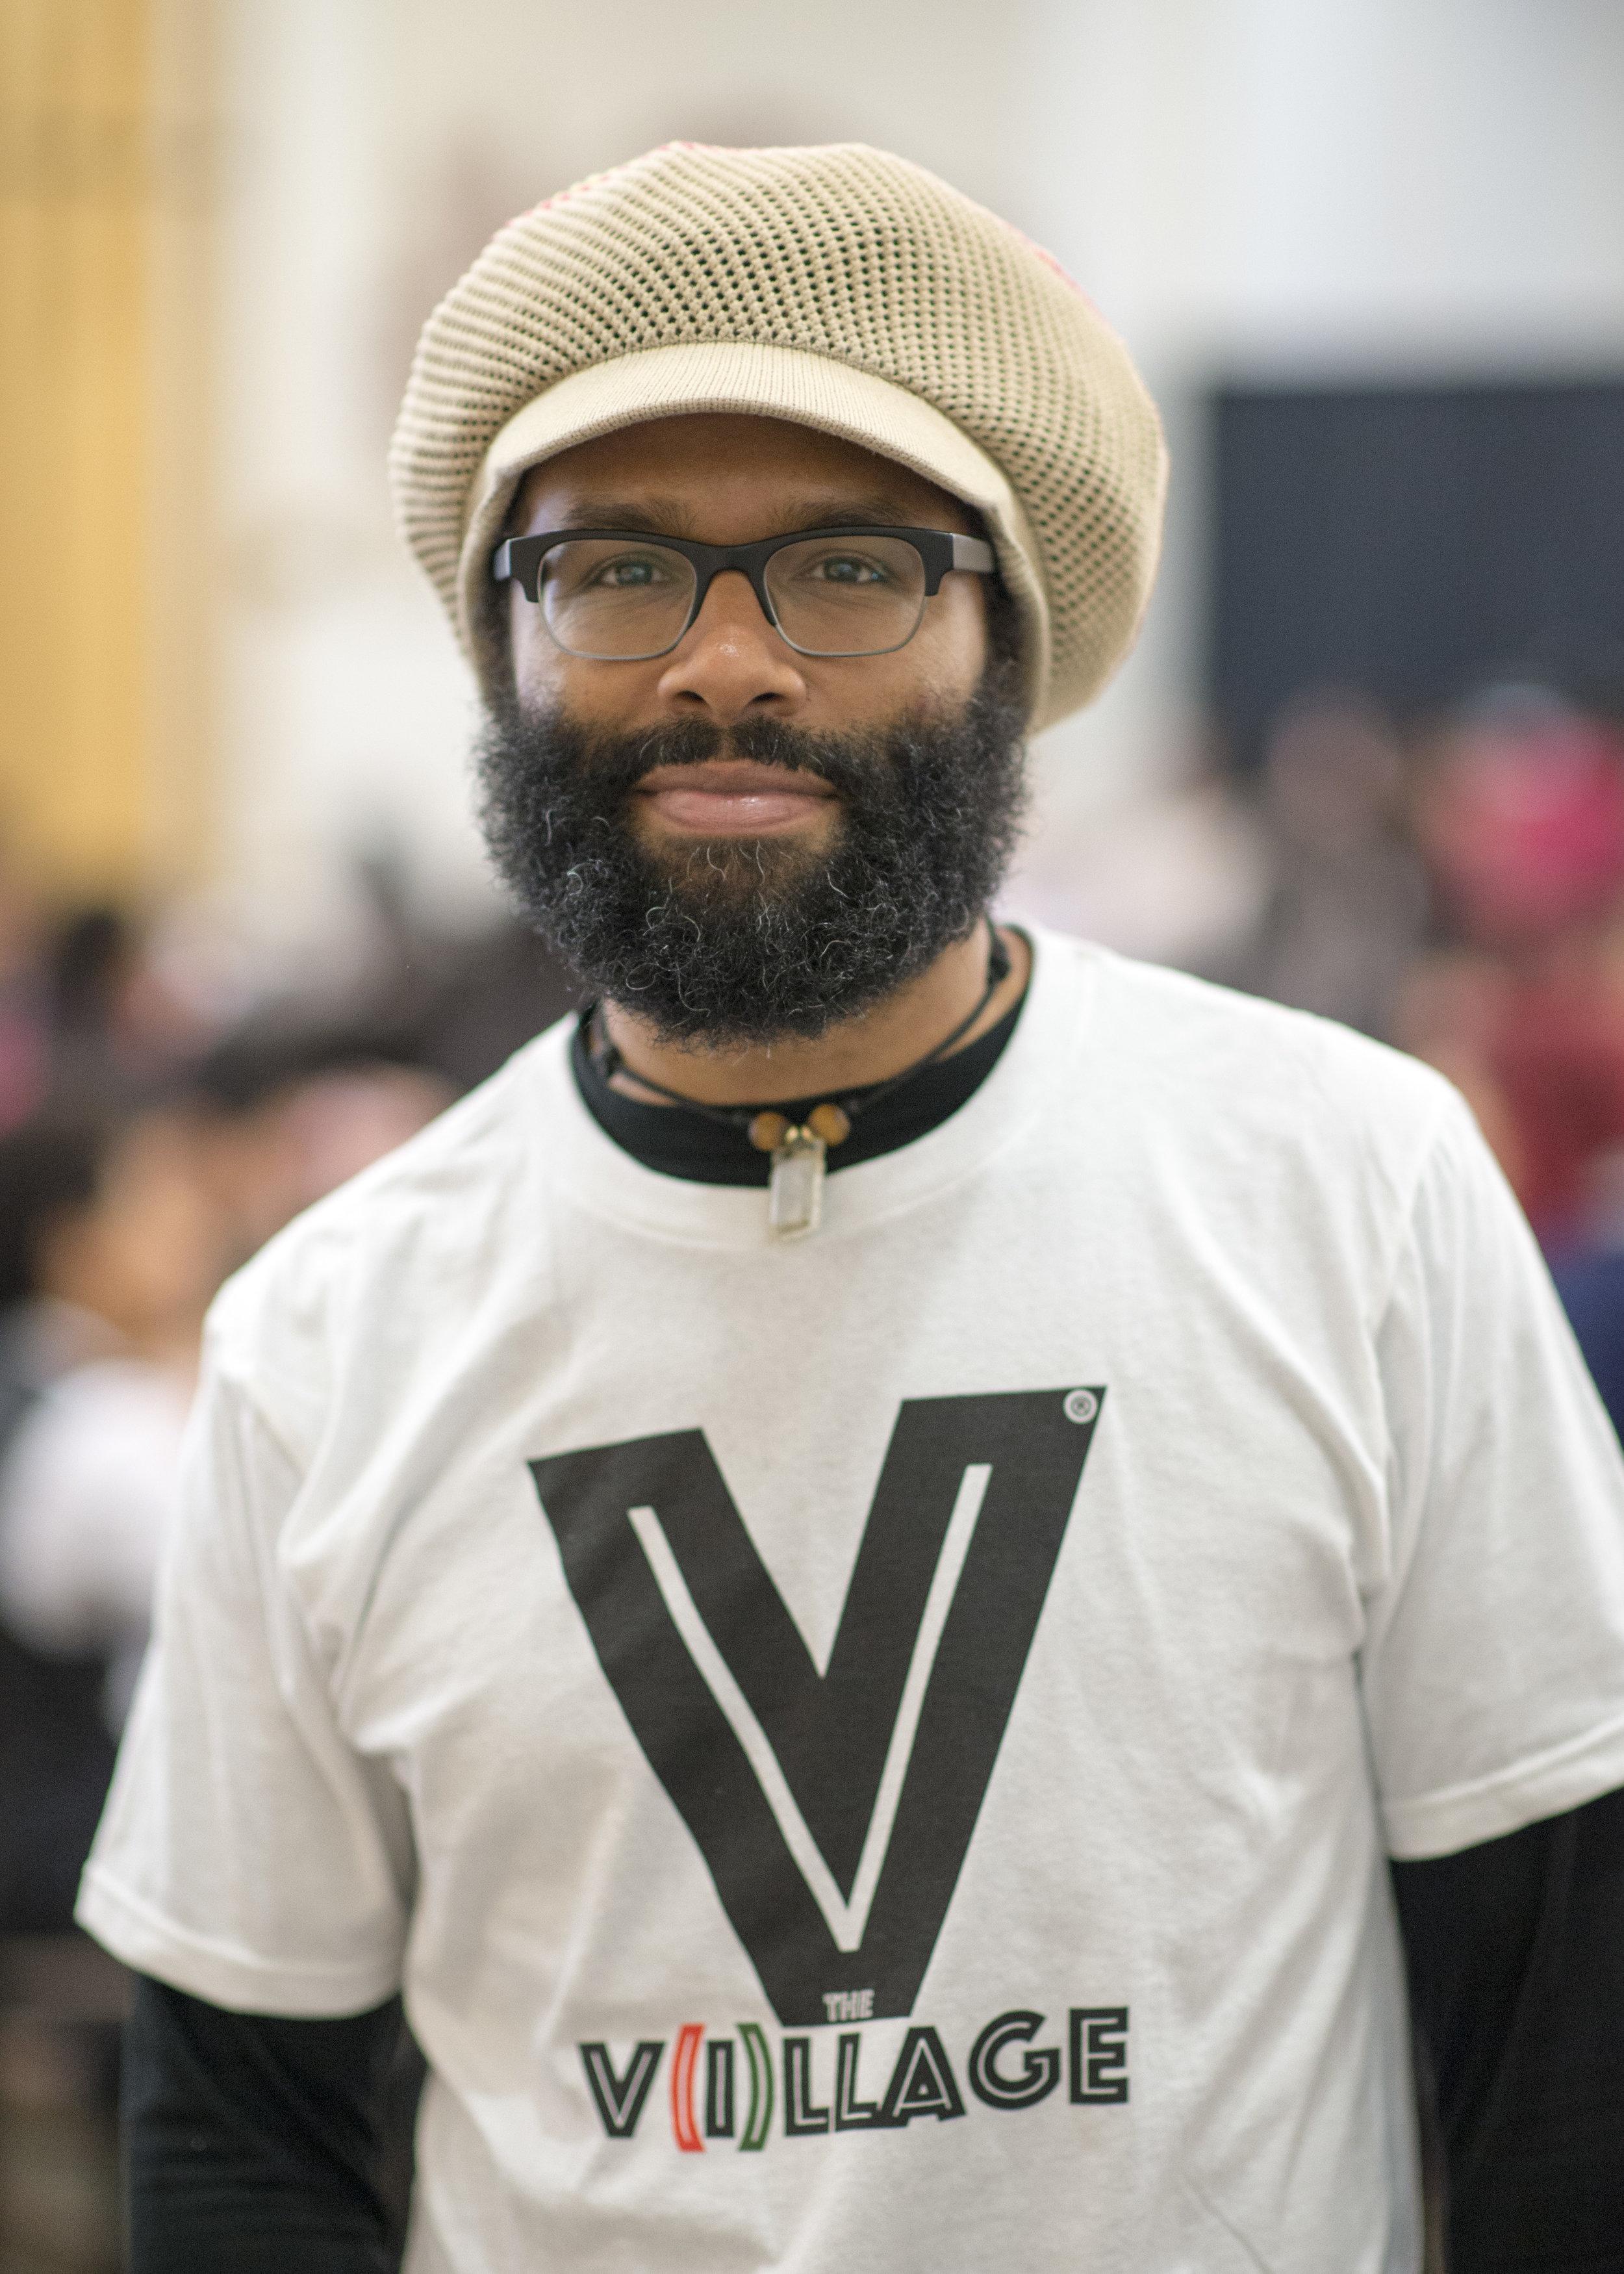 Graduate student + Black Graduate Student President Volunteer Eliot Sykes attending the STEM U event at the University of Utah.